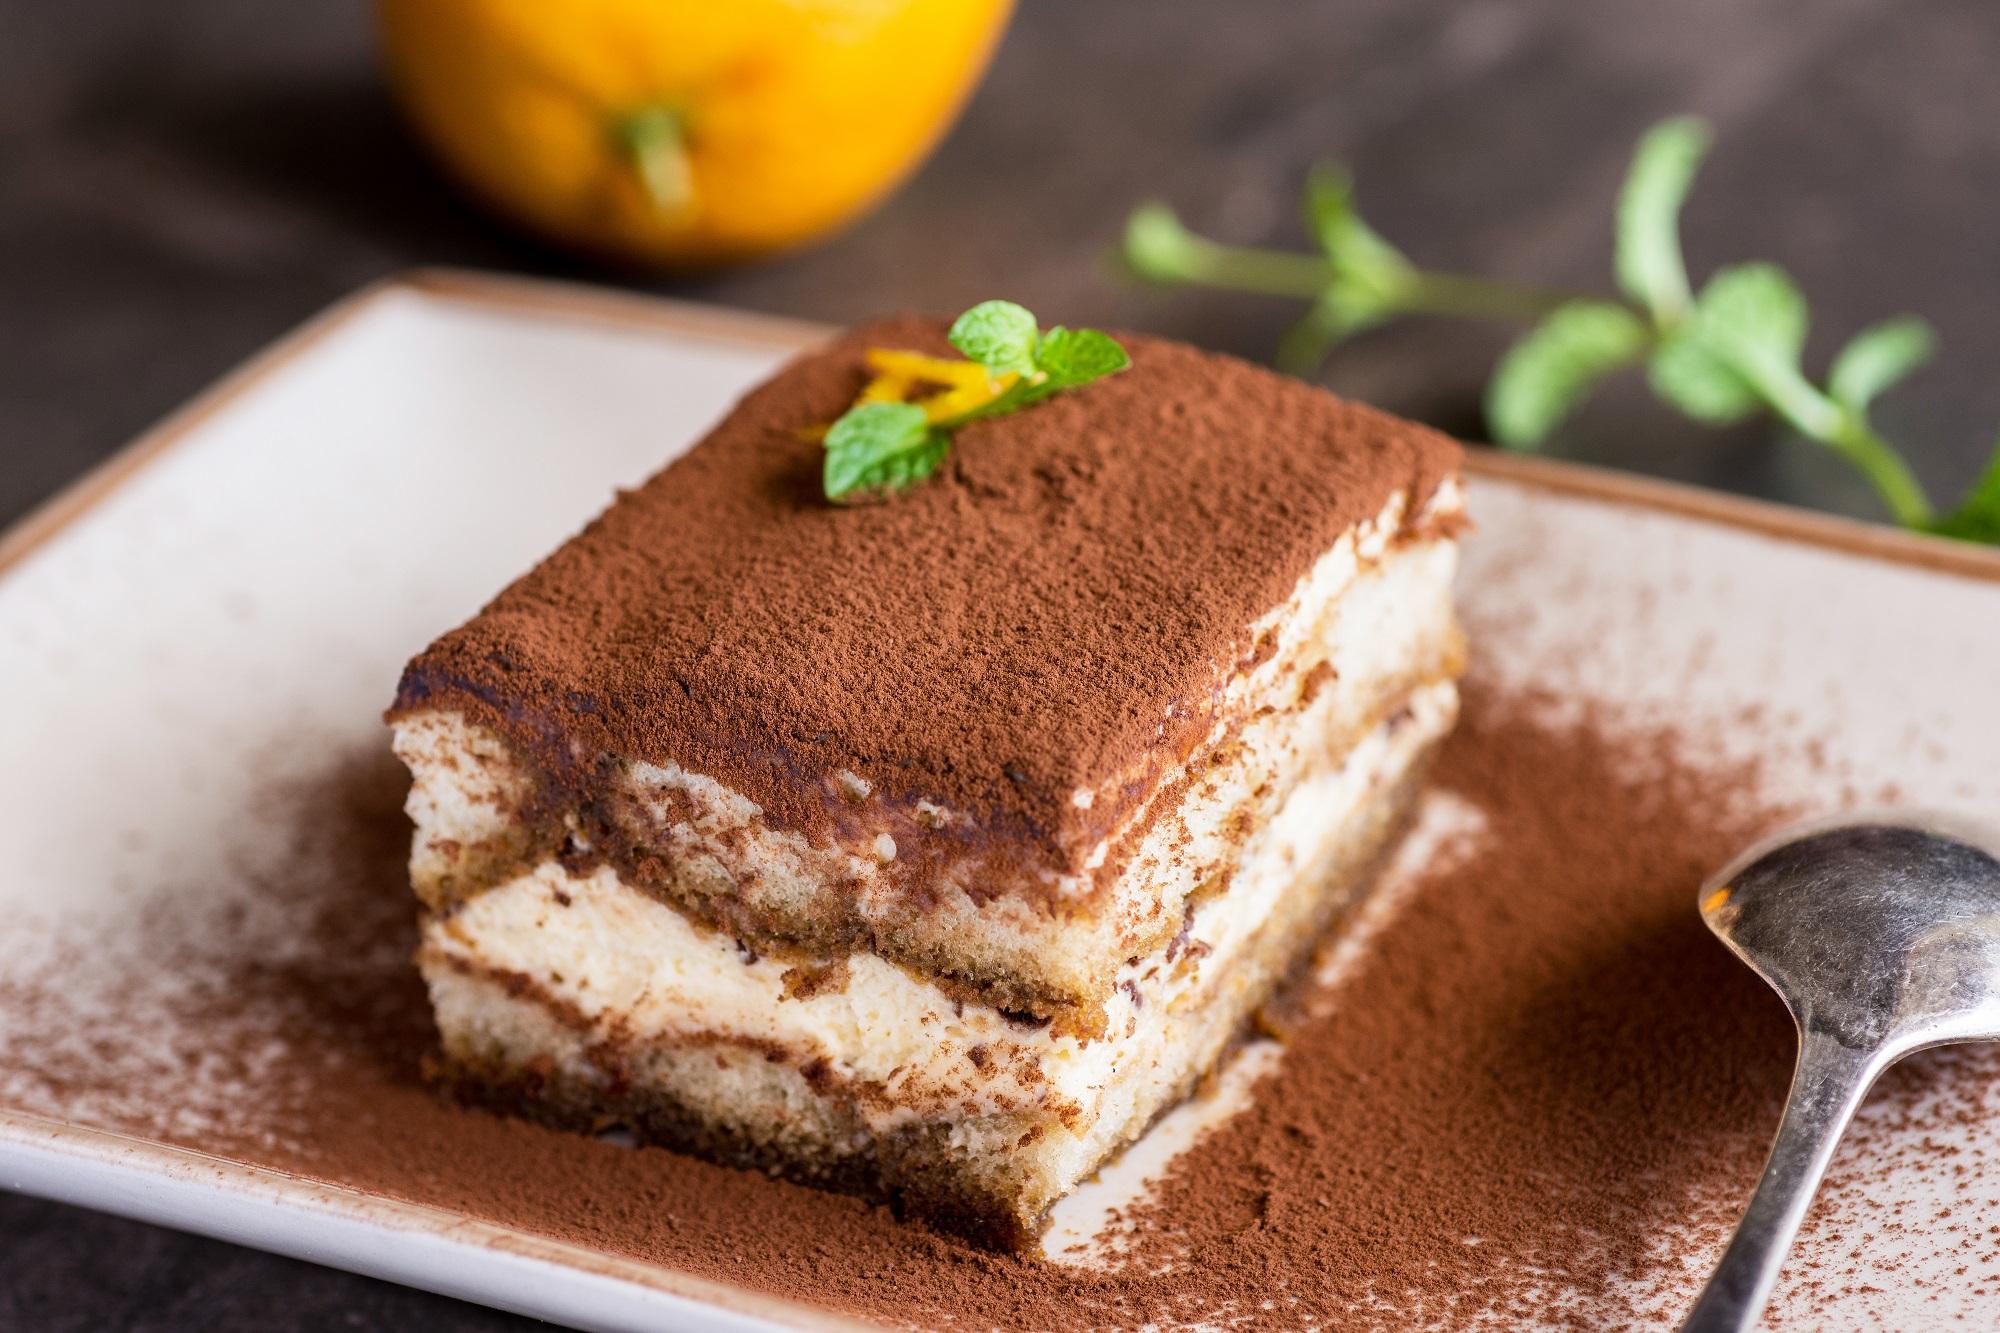 desserts in sheffield